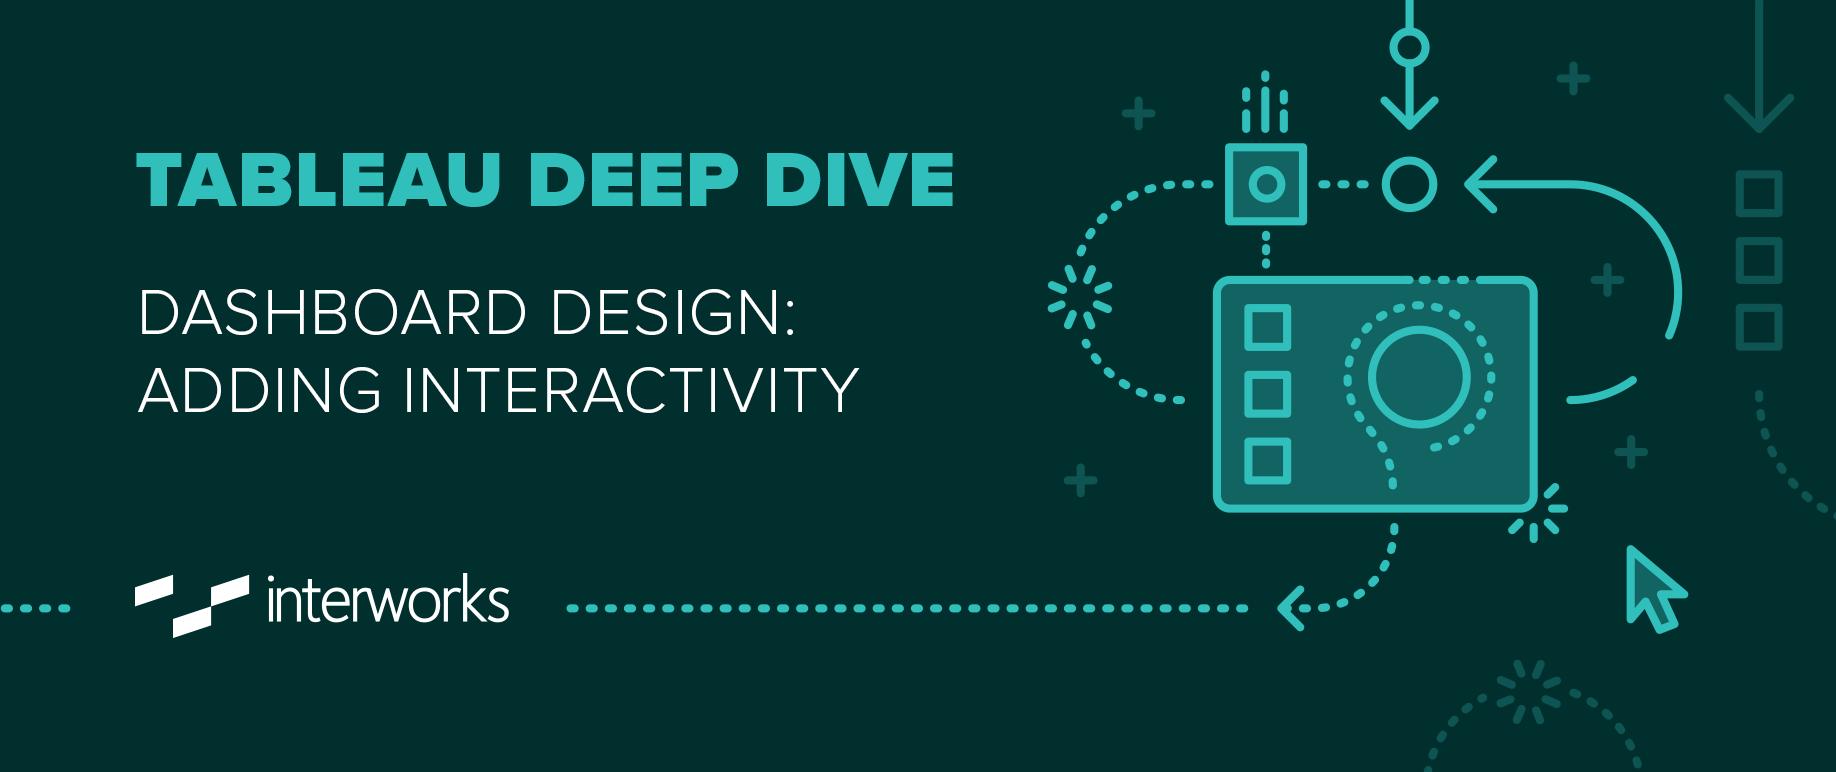 Tableau Deep Dive: Dashboard Design - Adding Interactivity   InterWorks